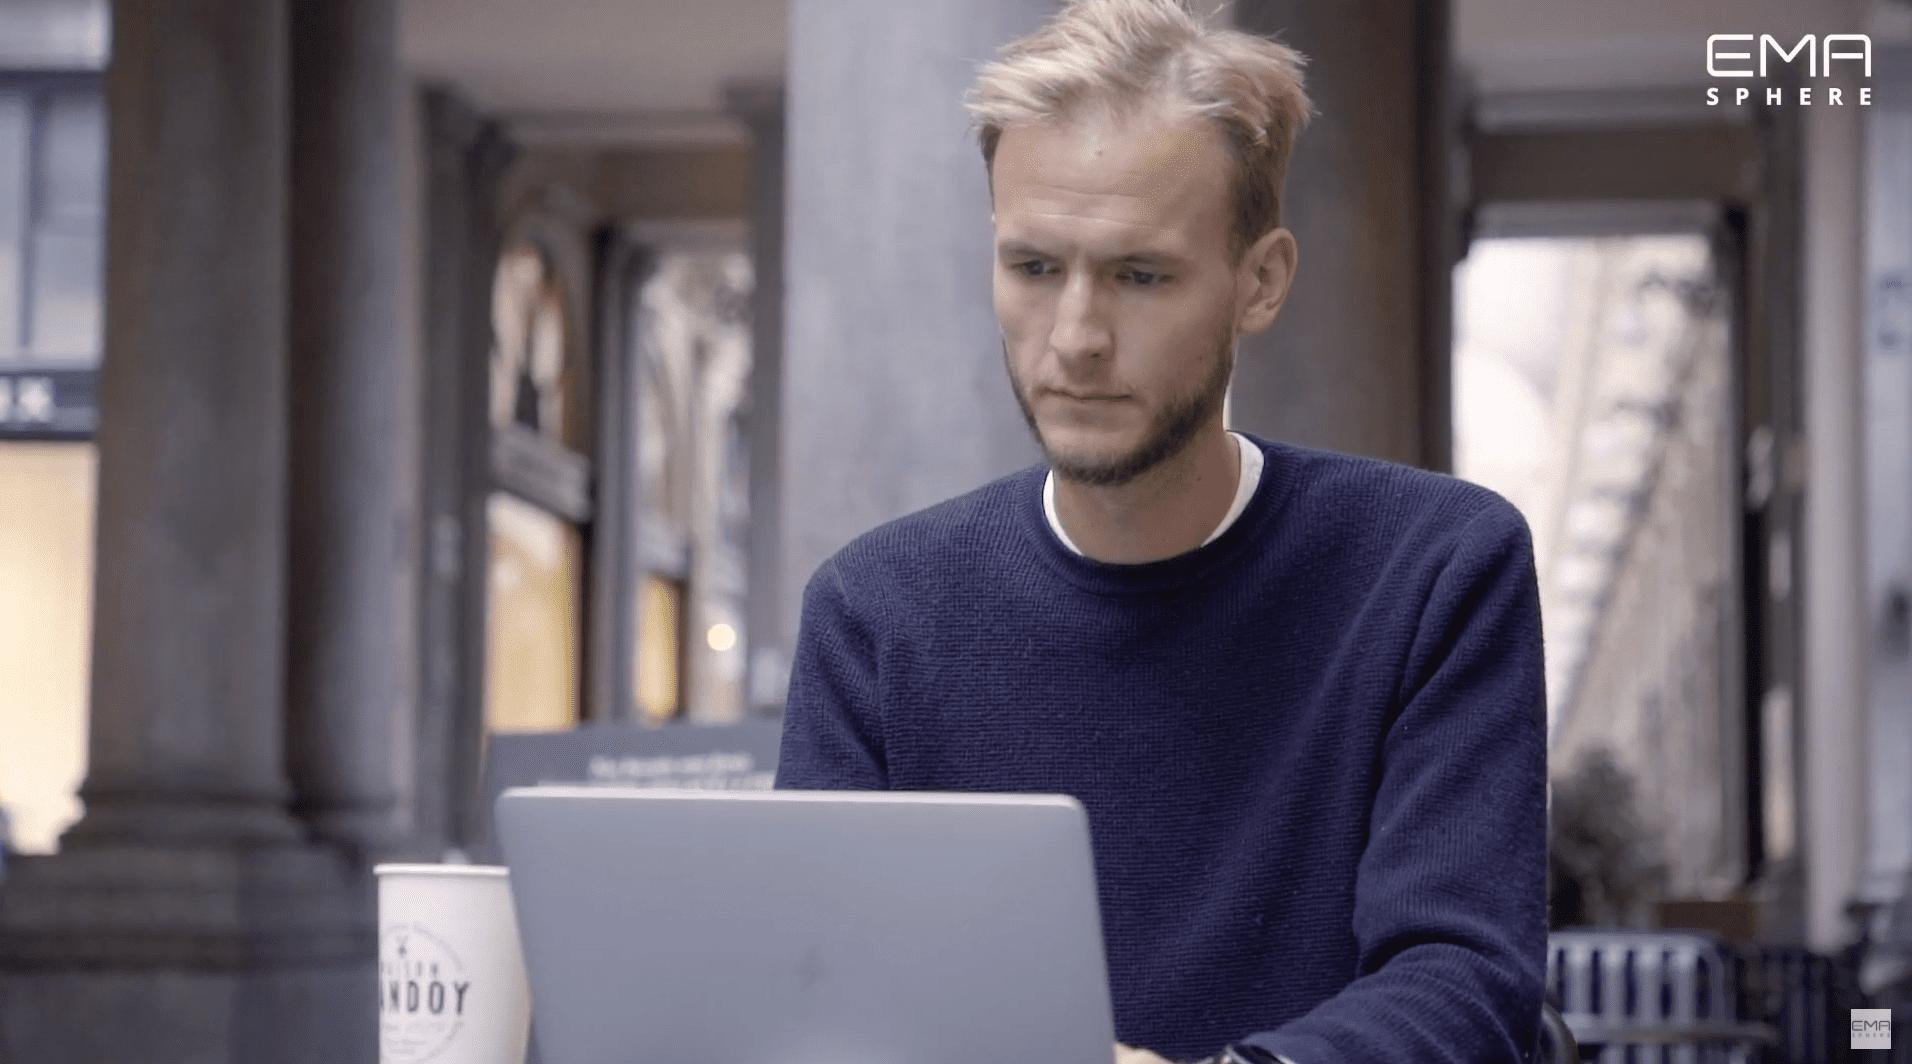 alexandre helson dandoy en train d'utiliser EMAsphere